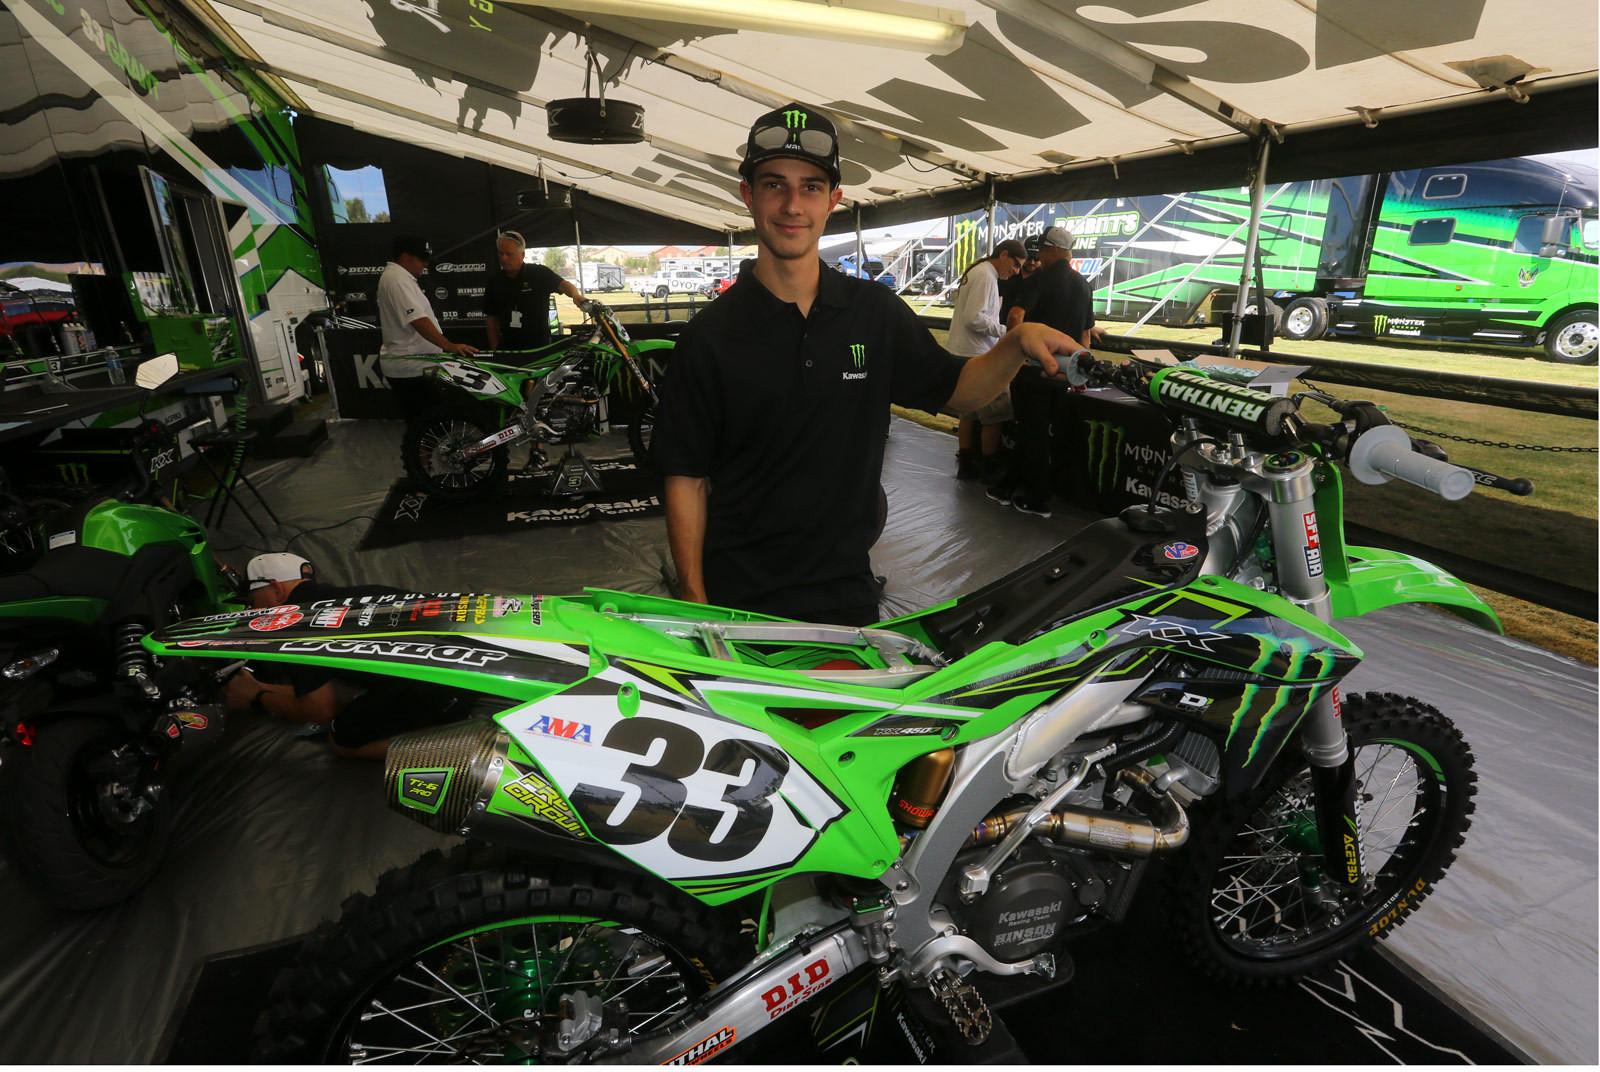 Travis Parry - Vital MX Pit Bits: 2016 Monster Energy Cup - Motocross Pictures - Vital MX